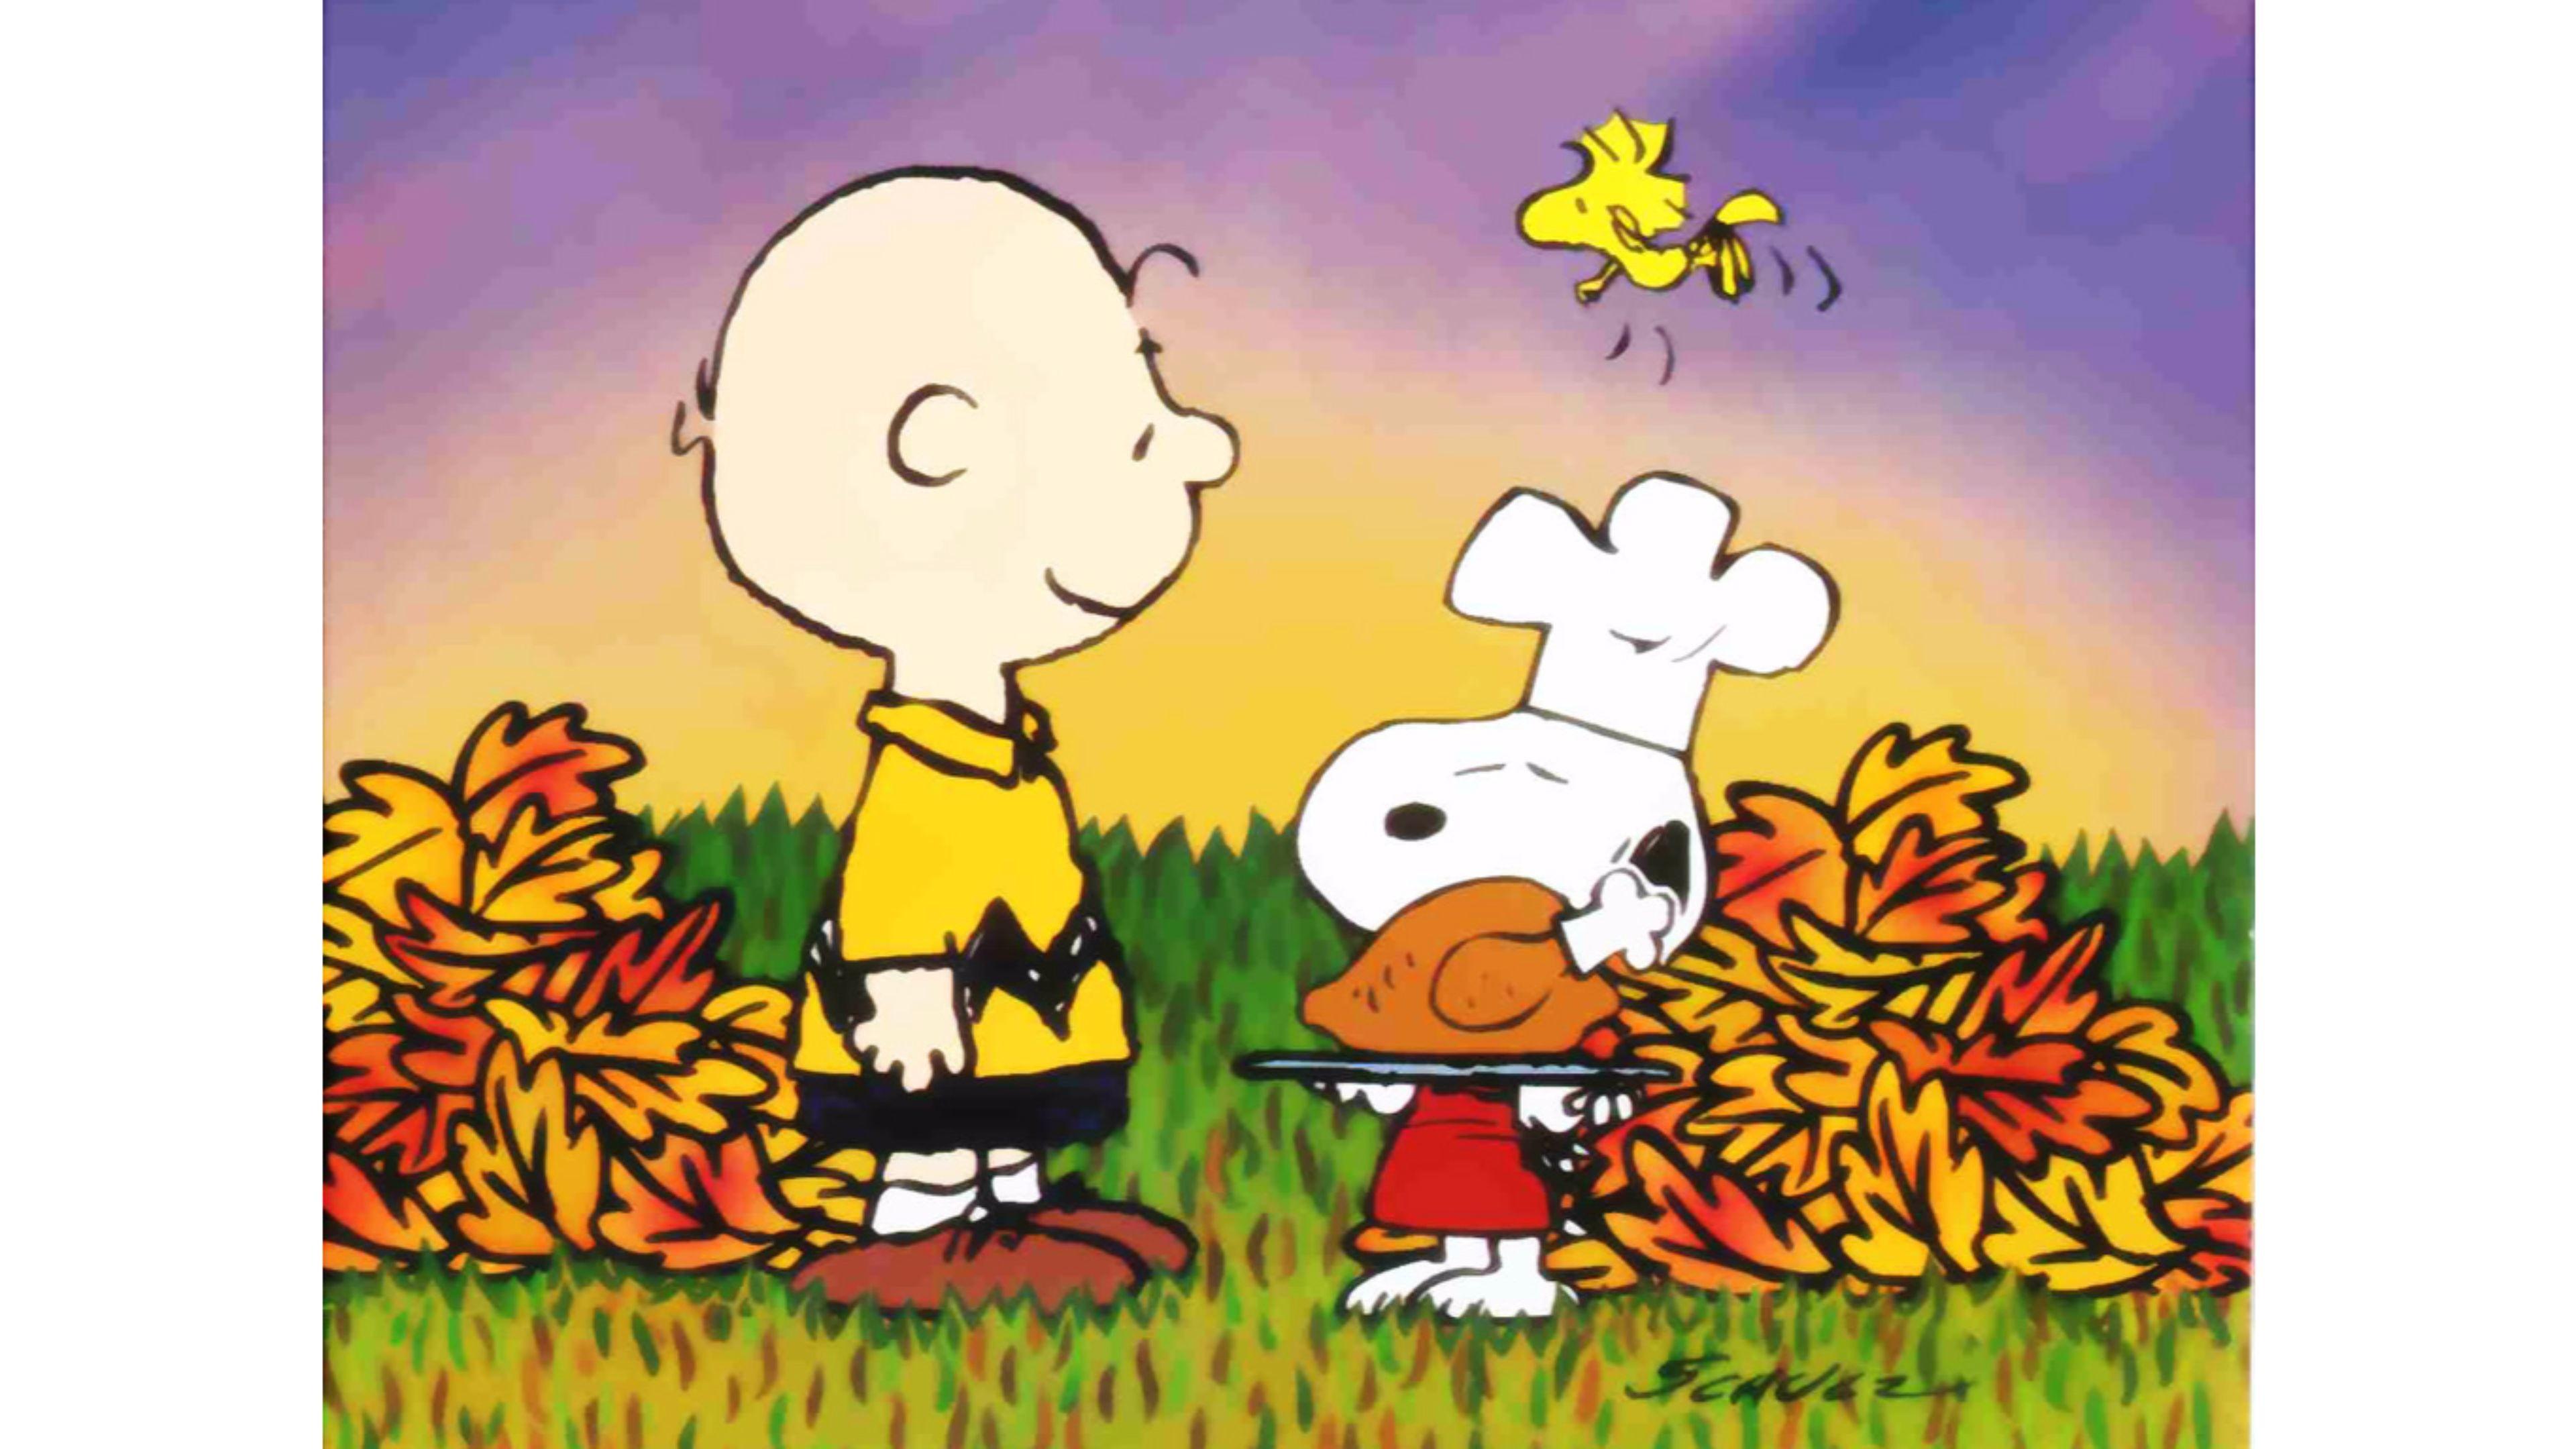 Peanuts Halloween Wallpaper (51+ images)